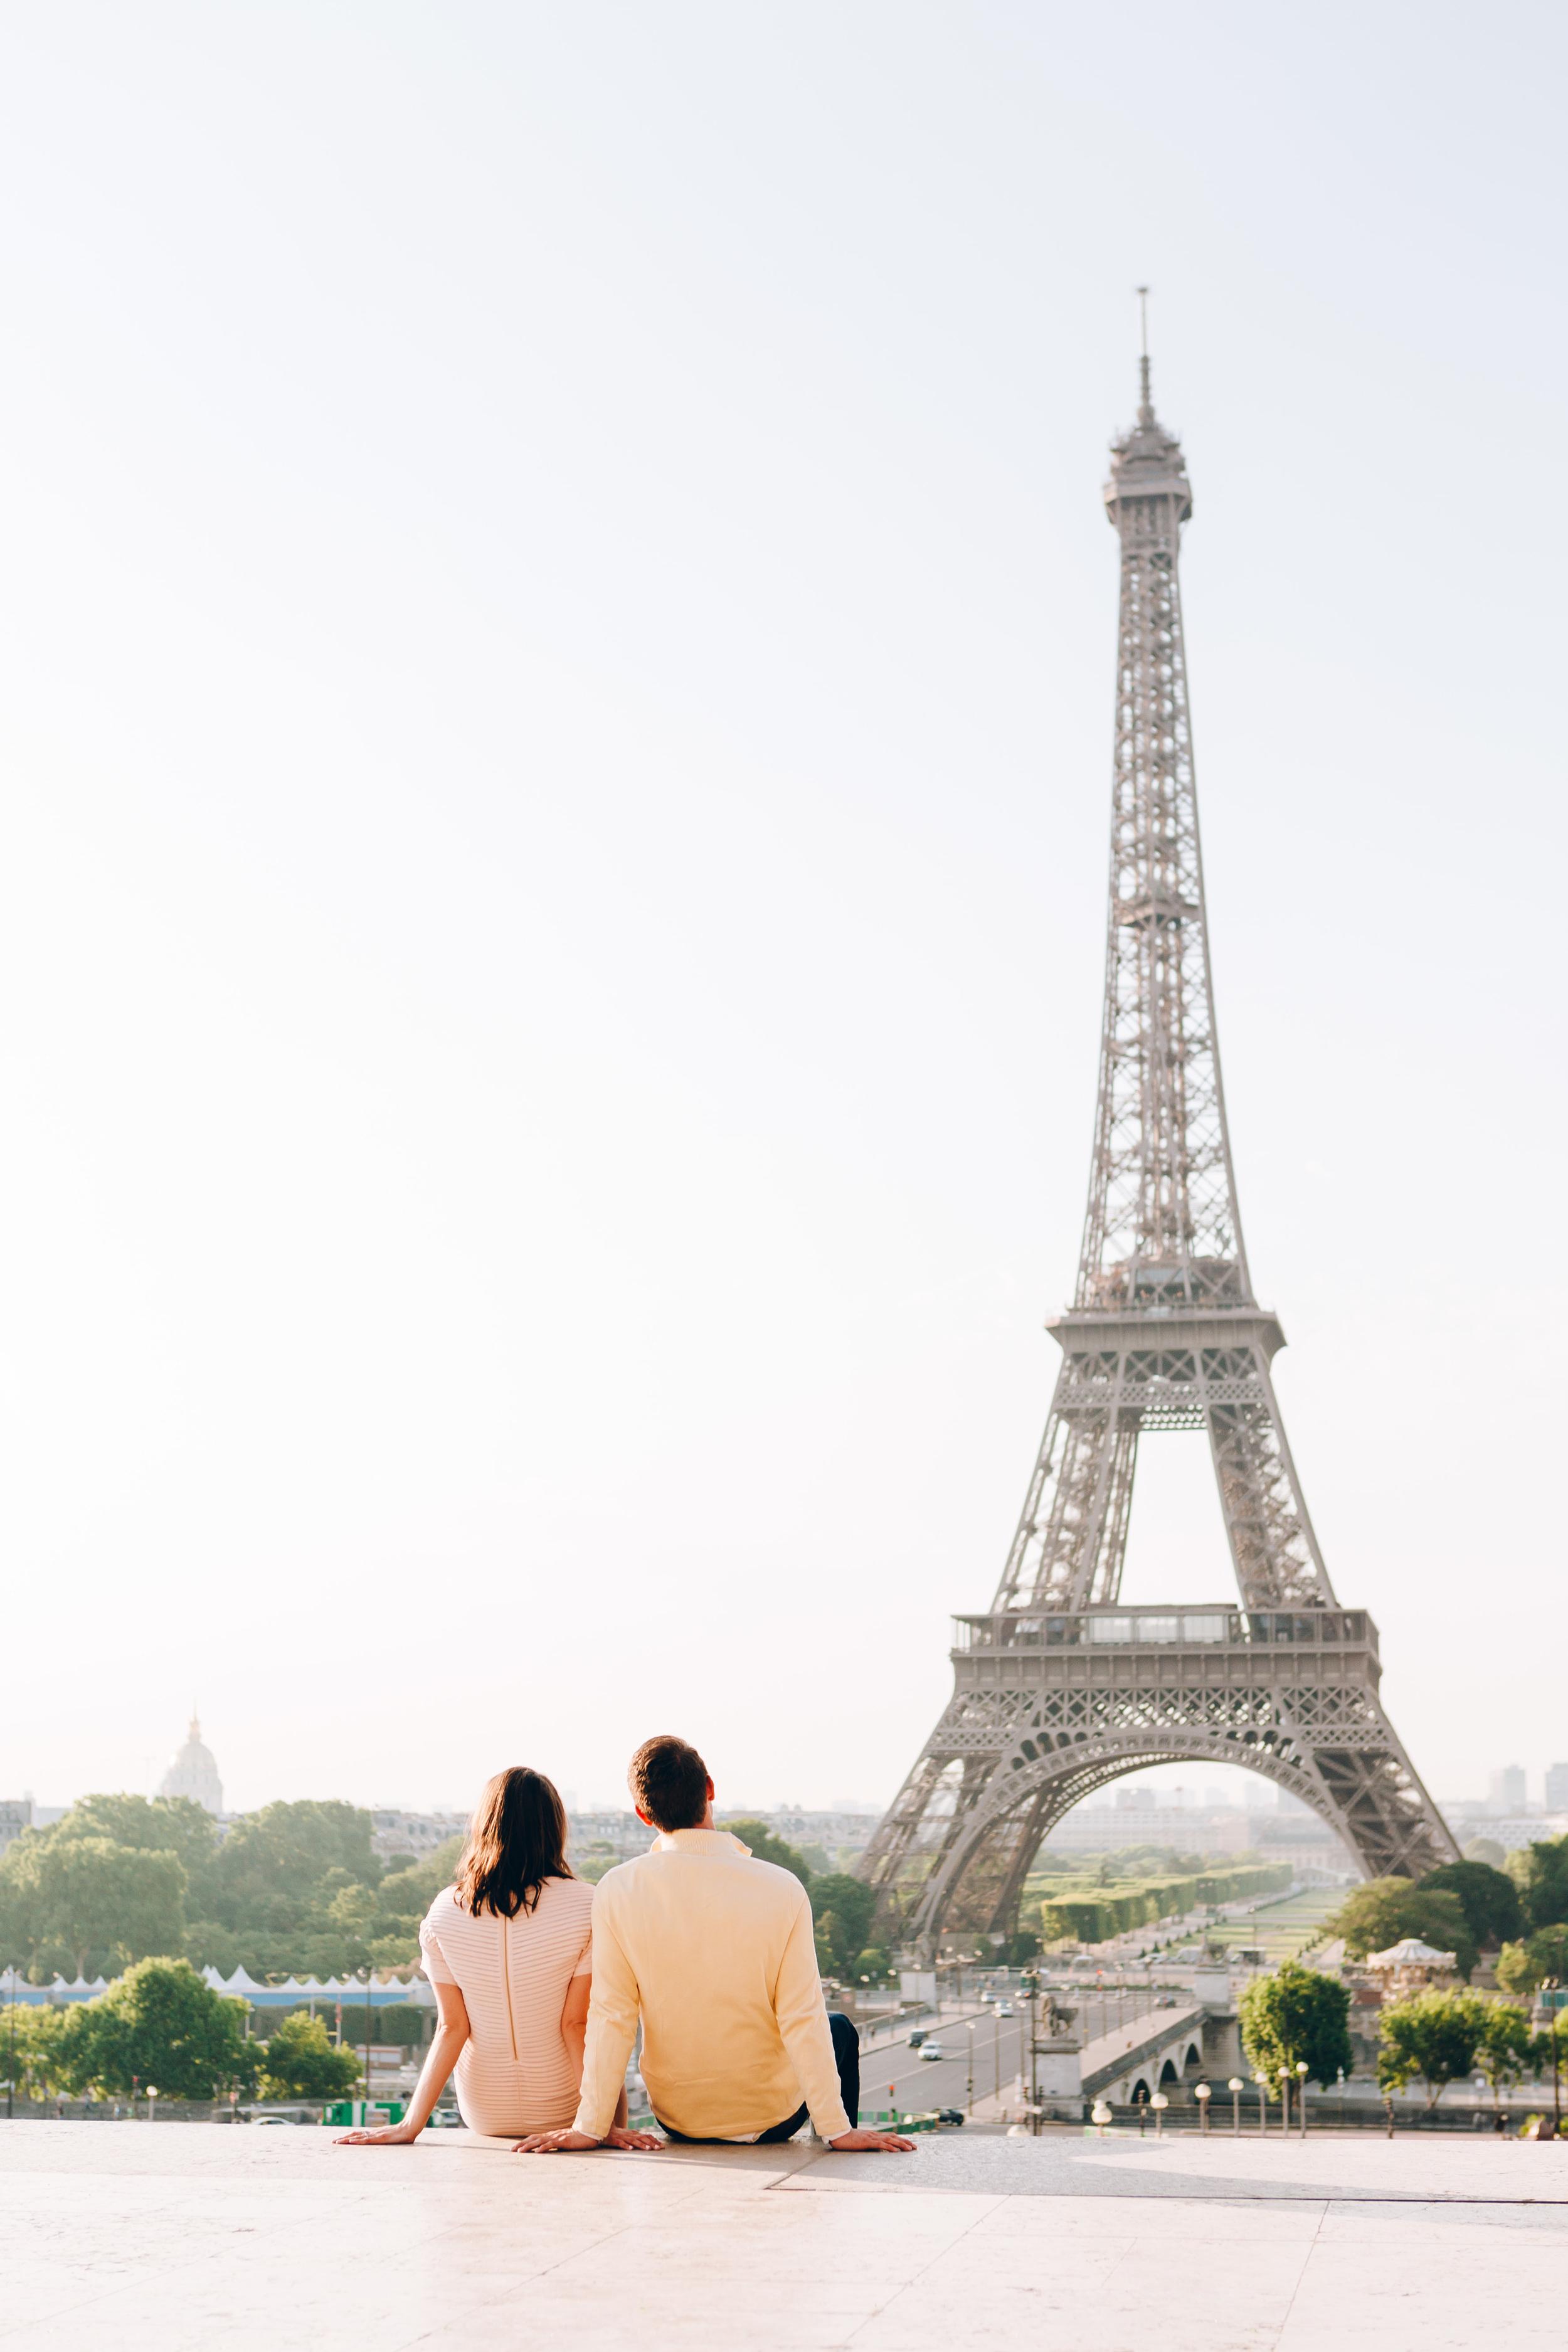 Photographer-In-Paris-Eiffel-Tower-Lovestory-Iheartparisfr.jpg